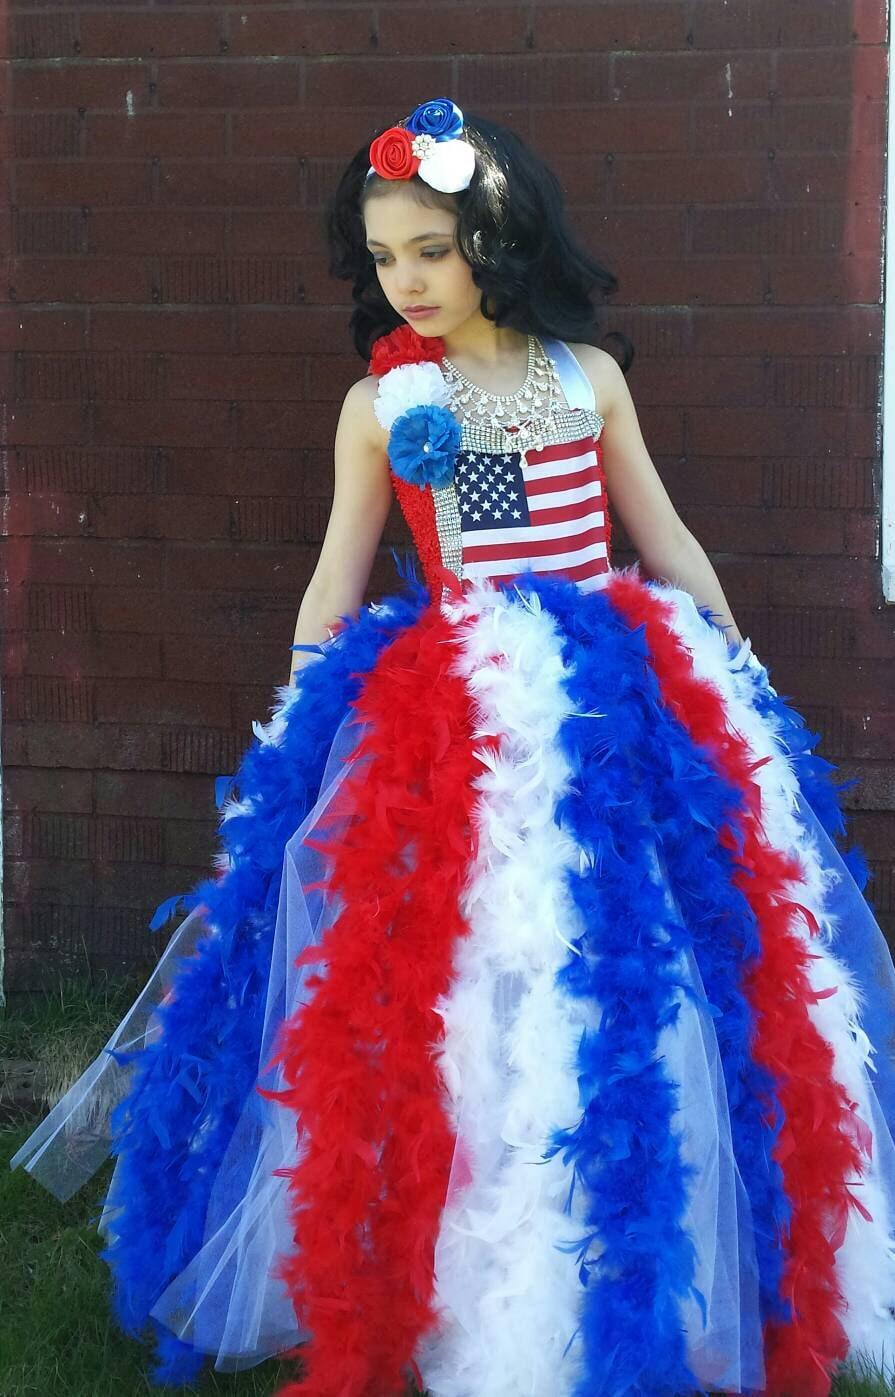 American flag tutu dress4th of July Tutu dress patriotic